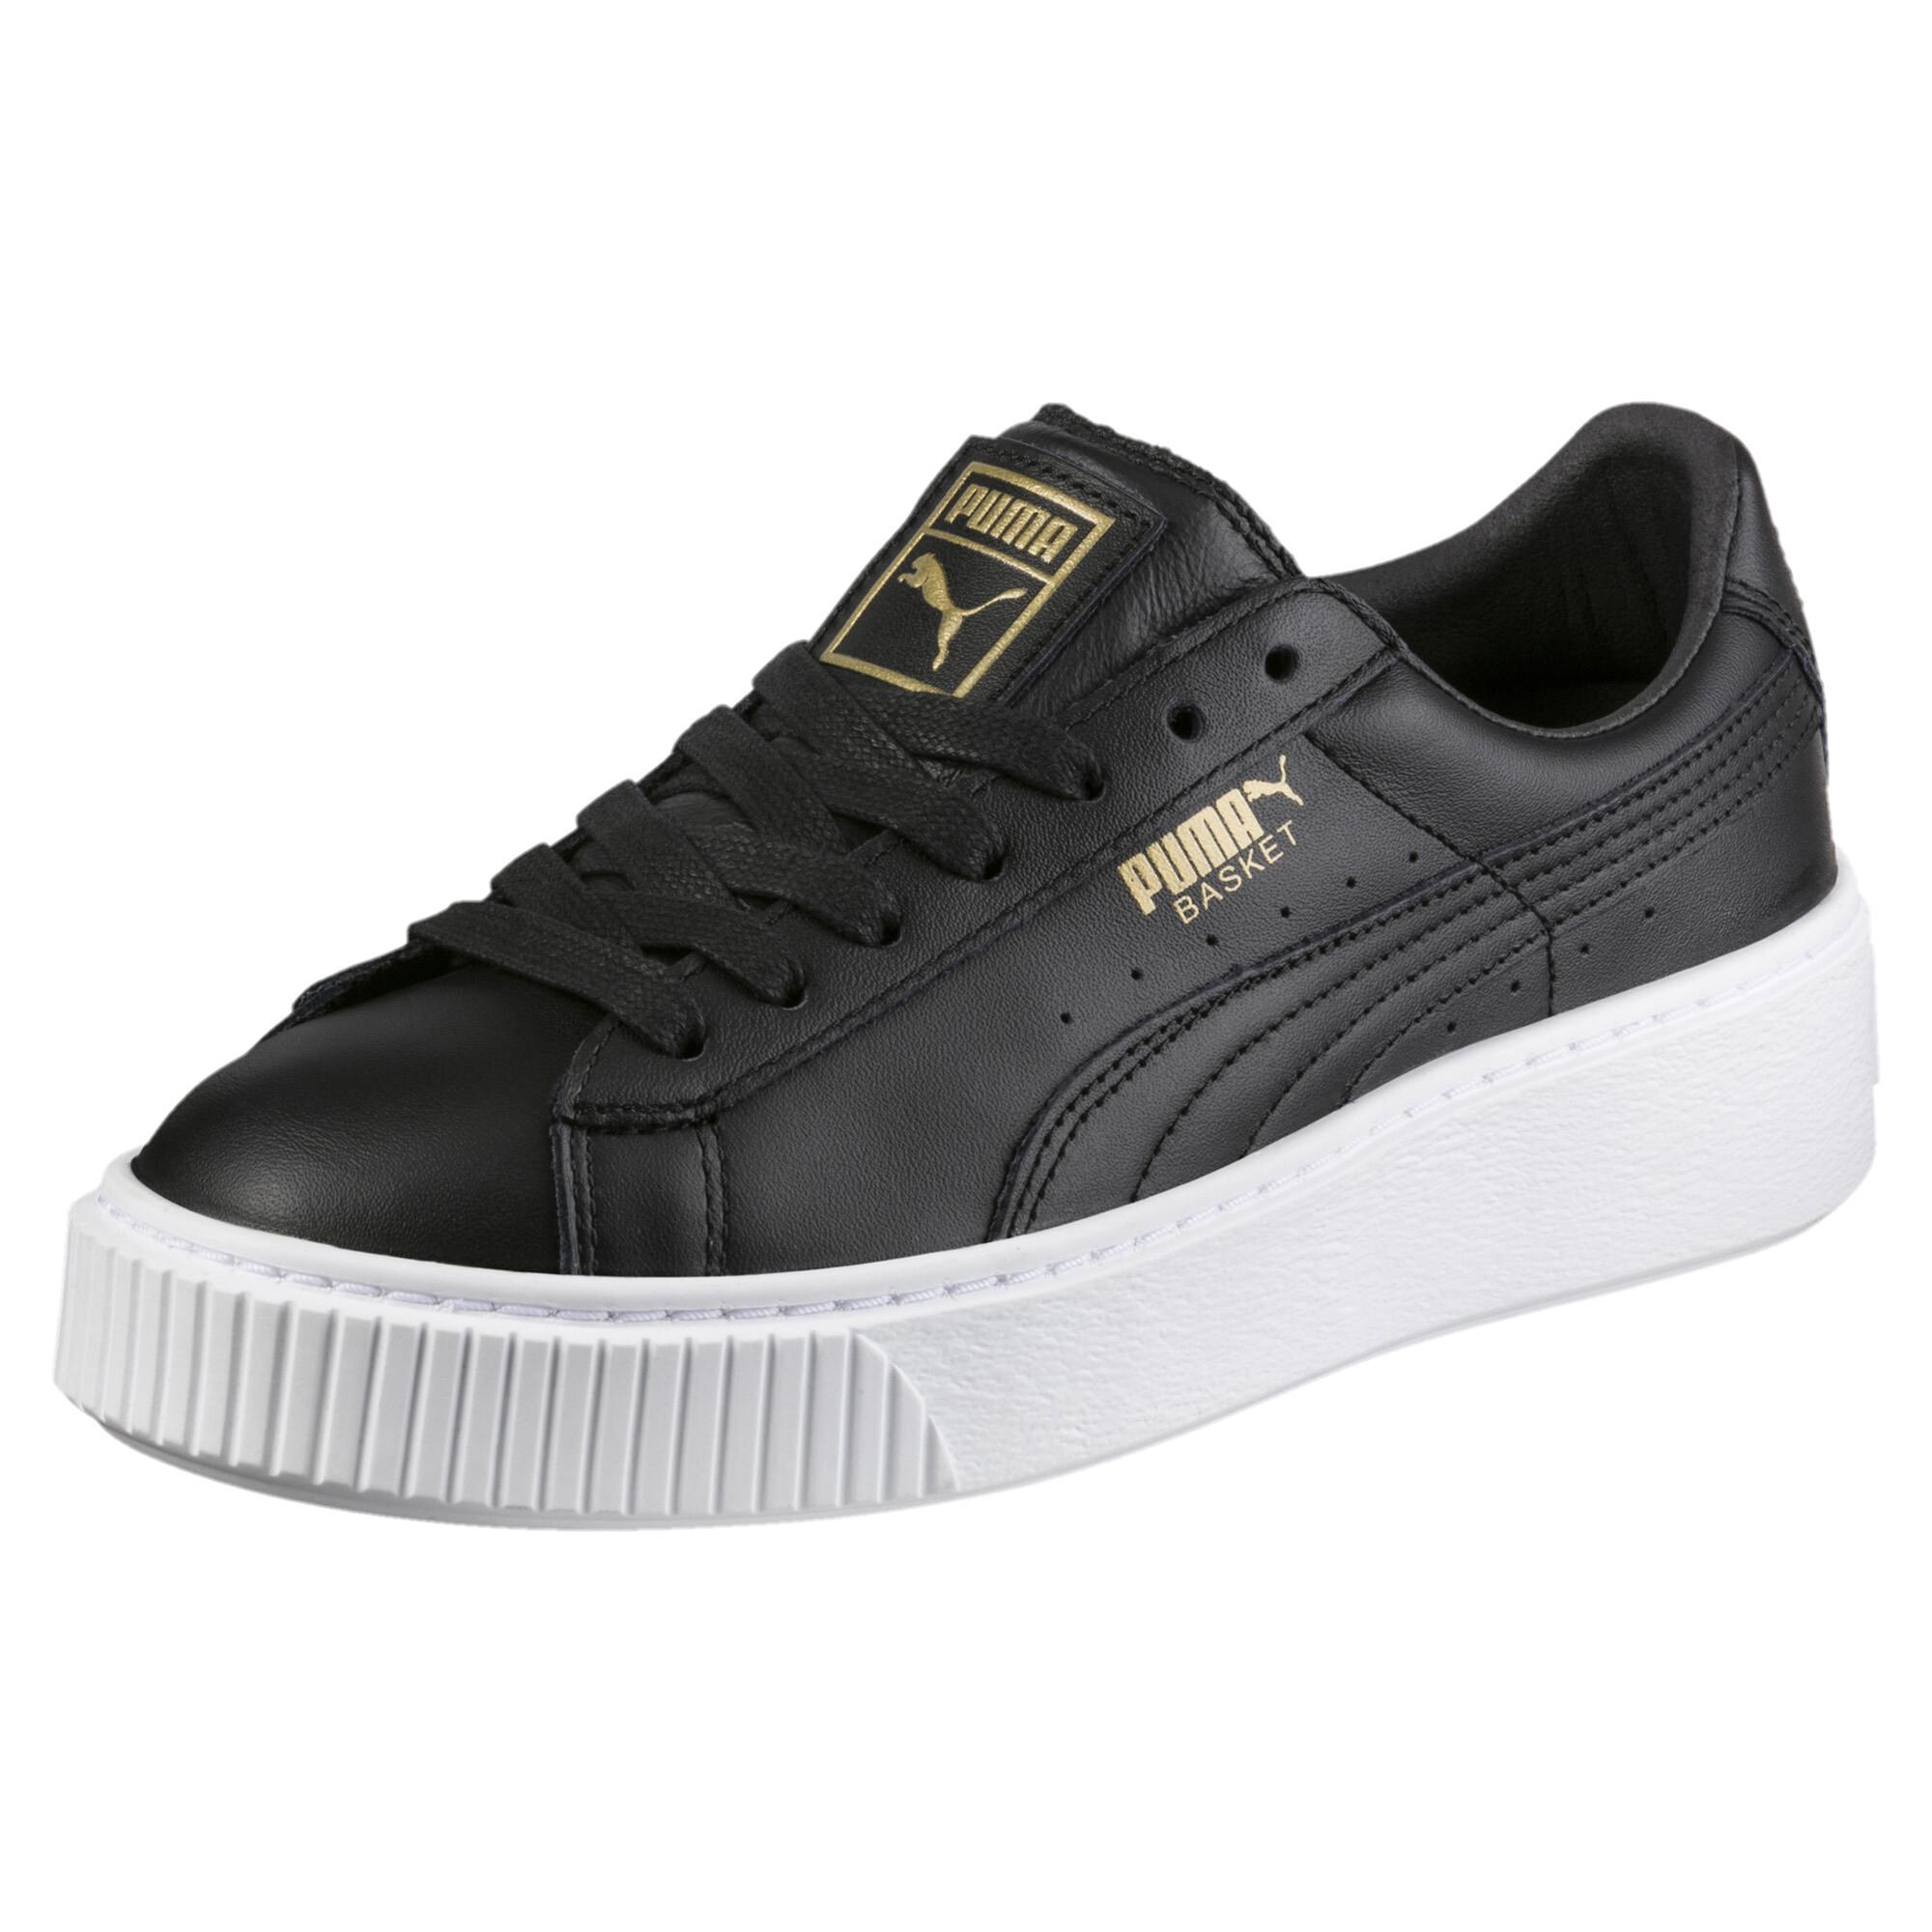 Details zu PUMA Basket Platform Core Damen Sneaker Frauen Schuhe Sport  Classics Neu